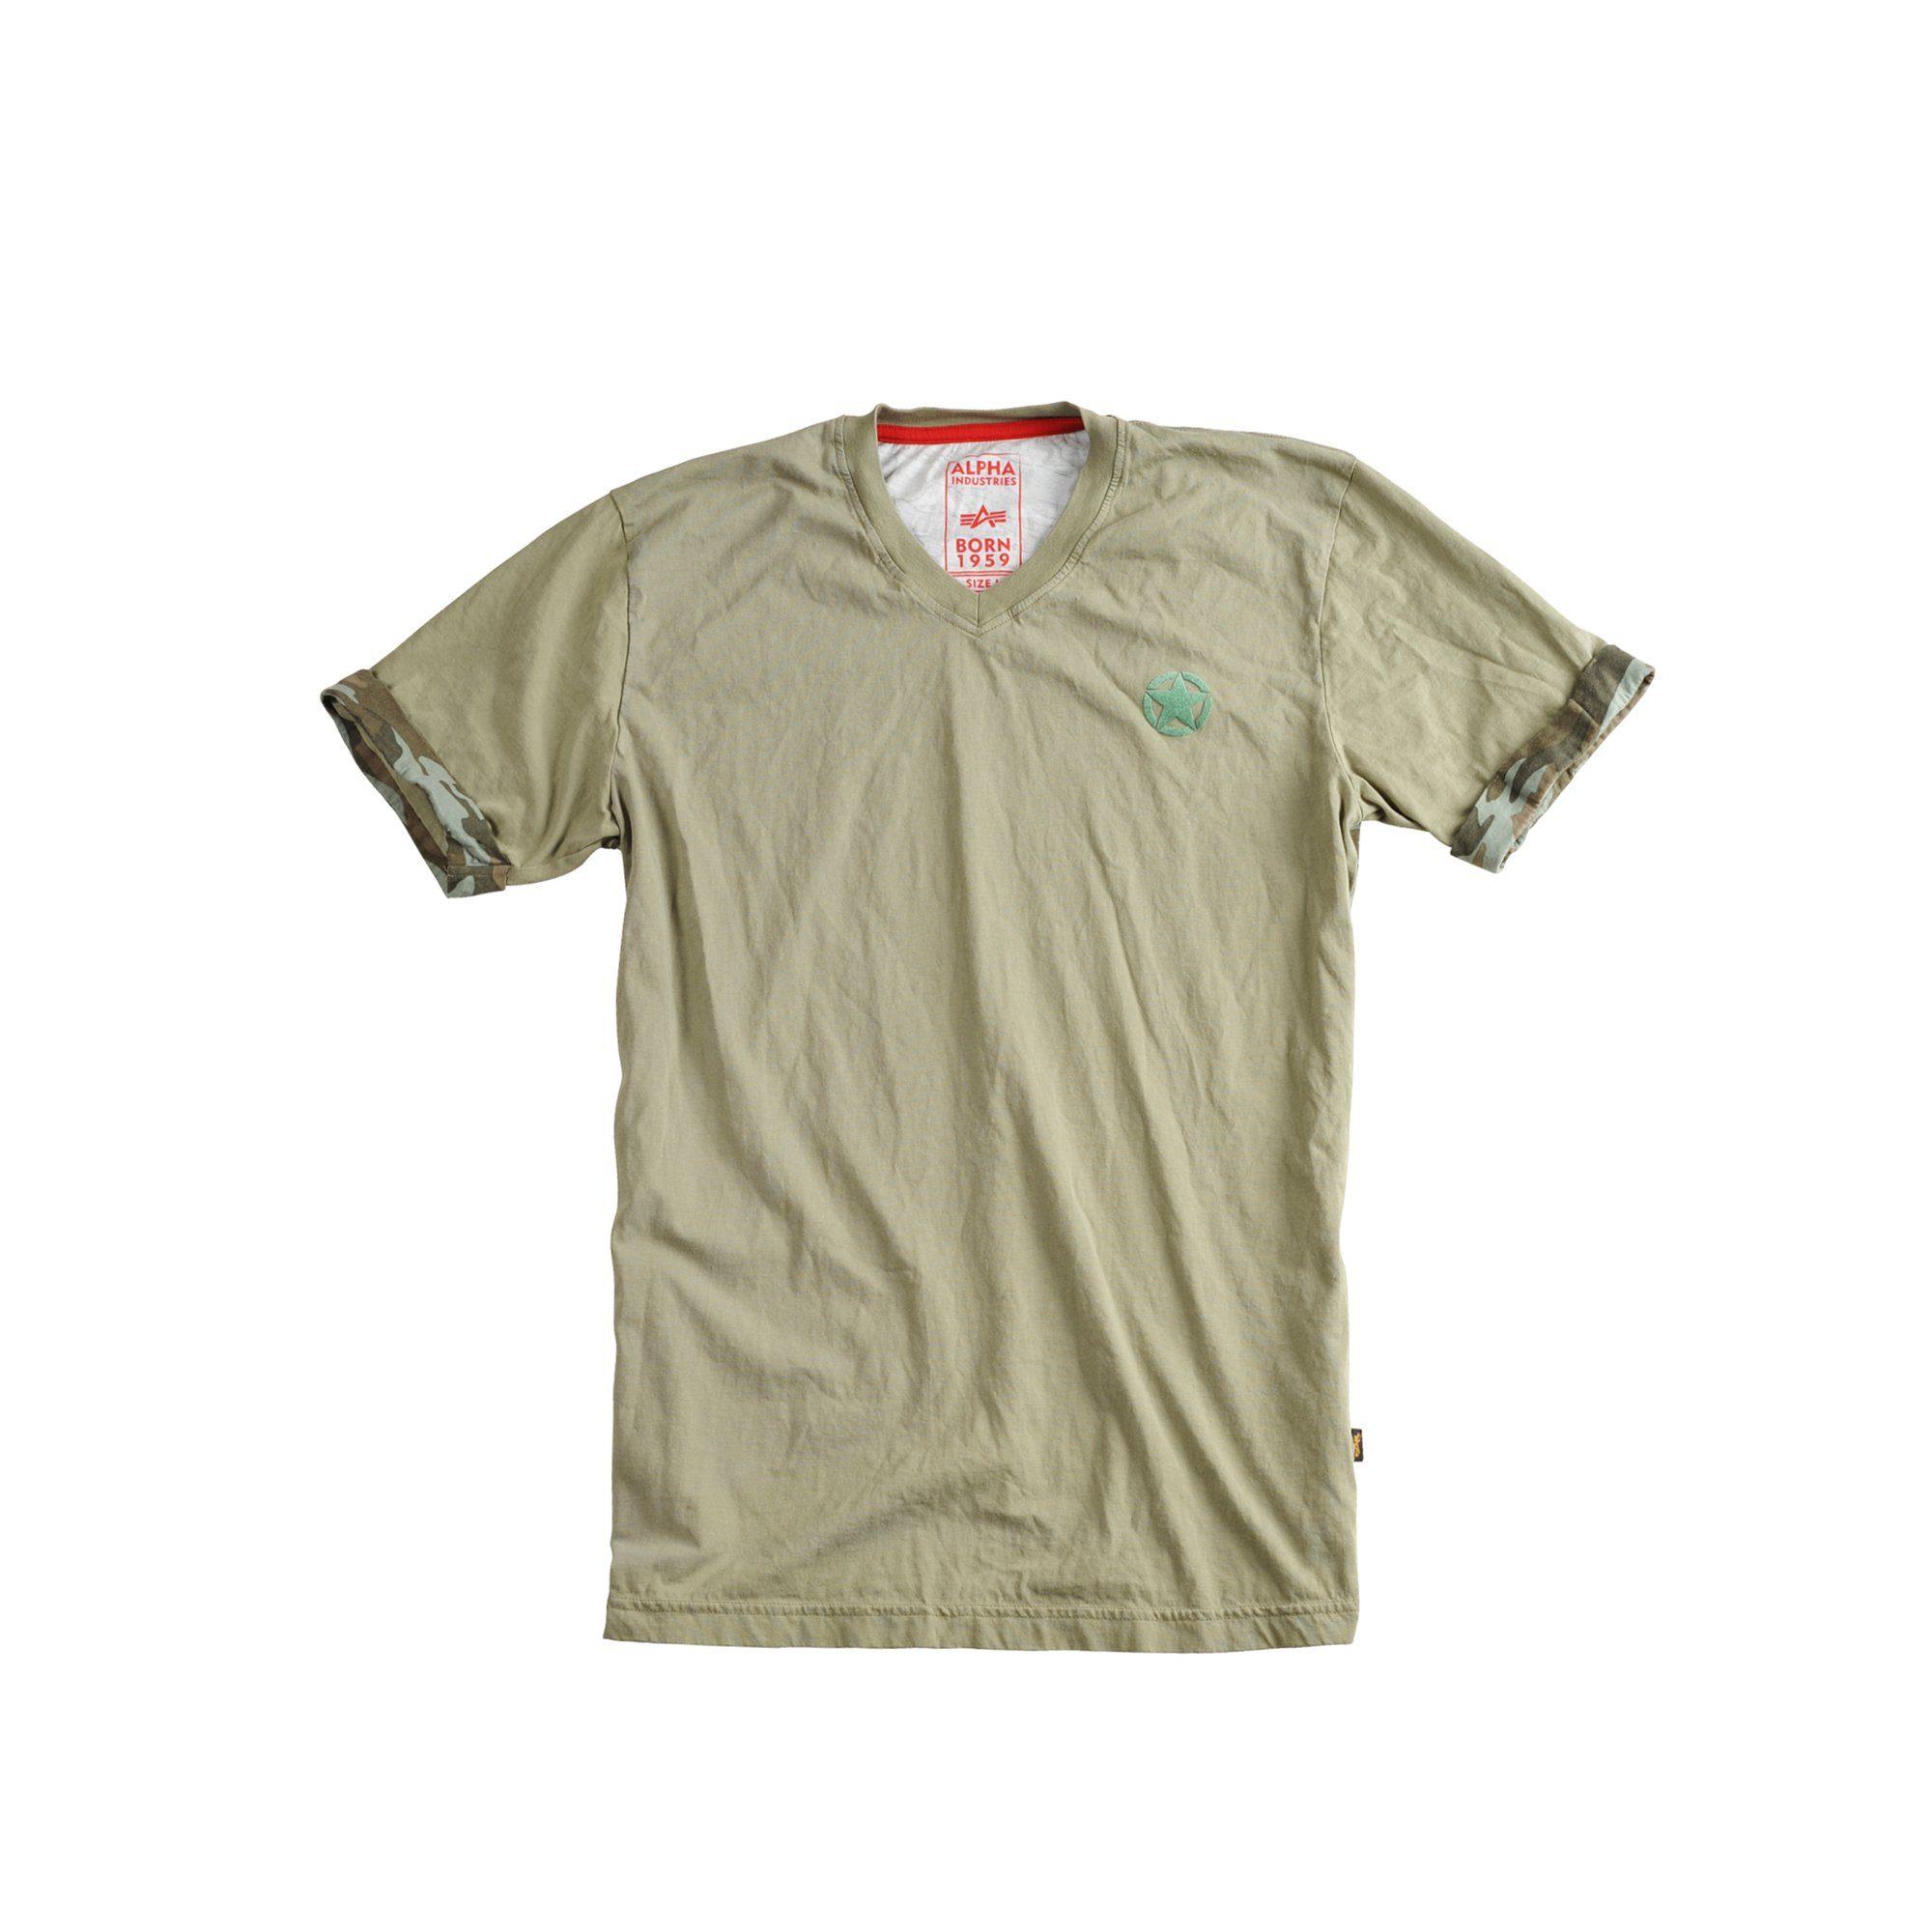 Business & Industrie Damenmode 25 Bedruckte Girlie T Shirts Damen Shirts Mädchen Shirts Bedrucken Lassen GroßEs Sortiment